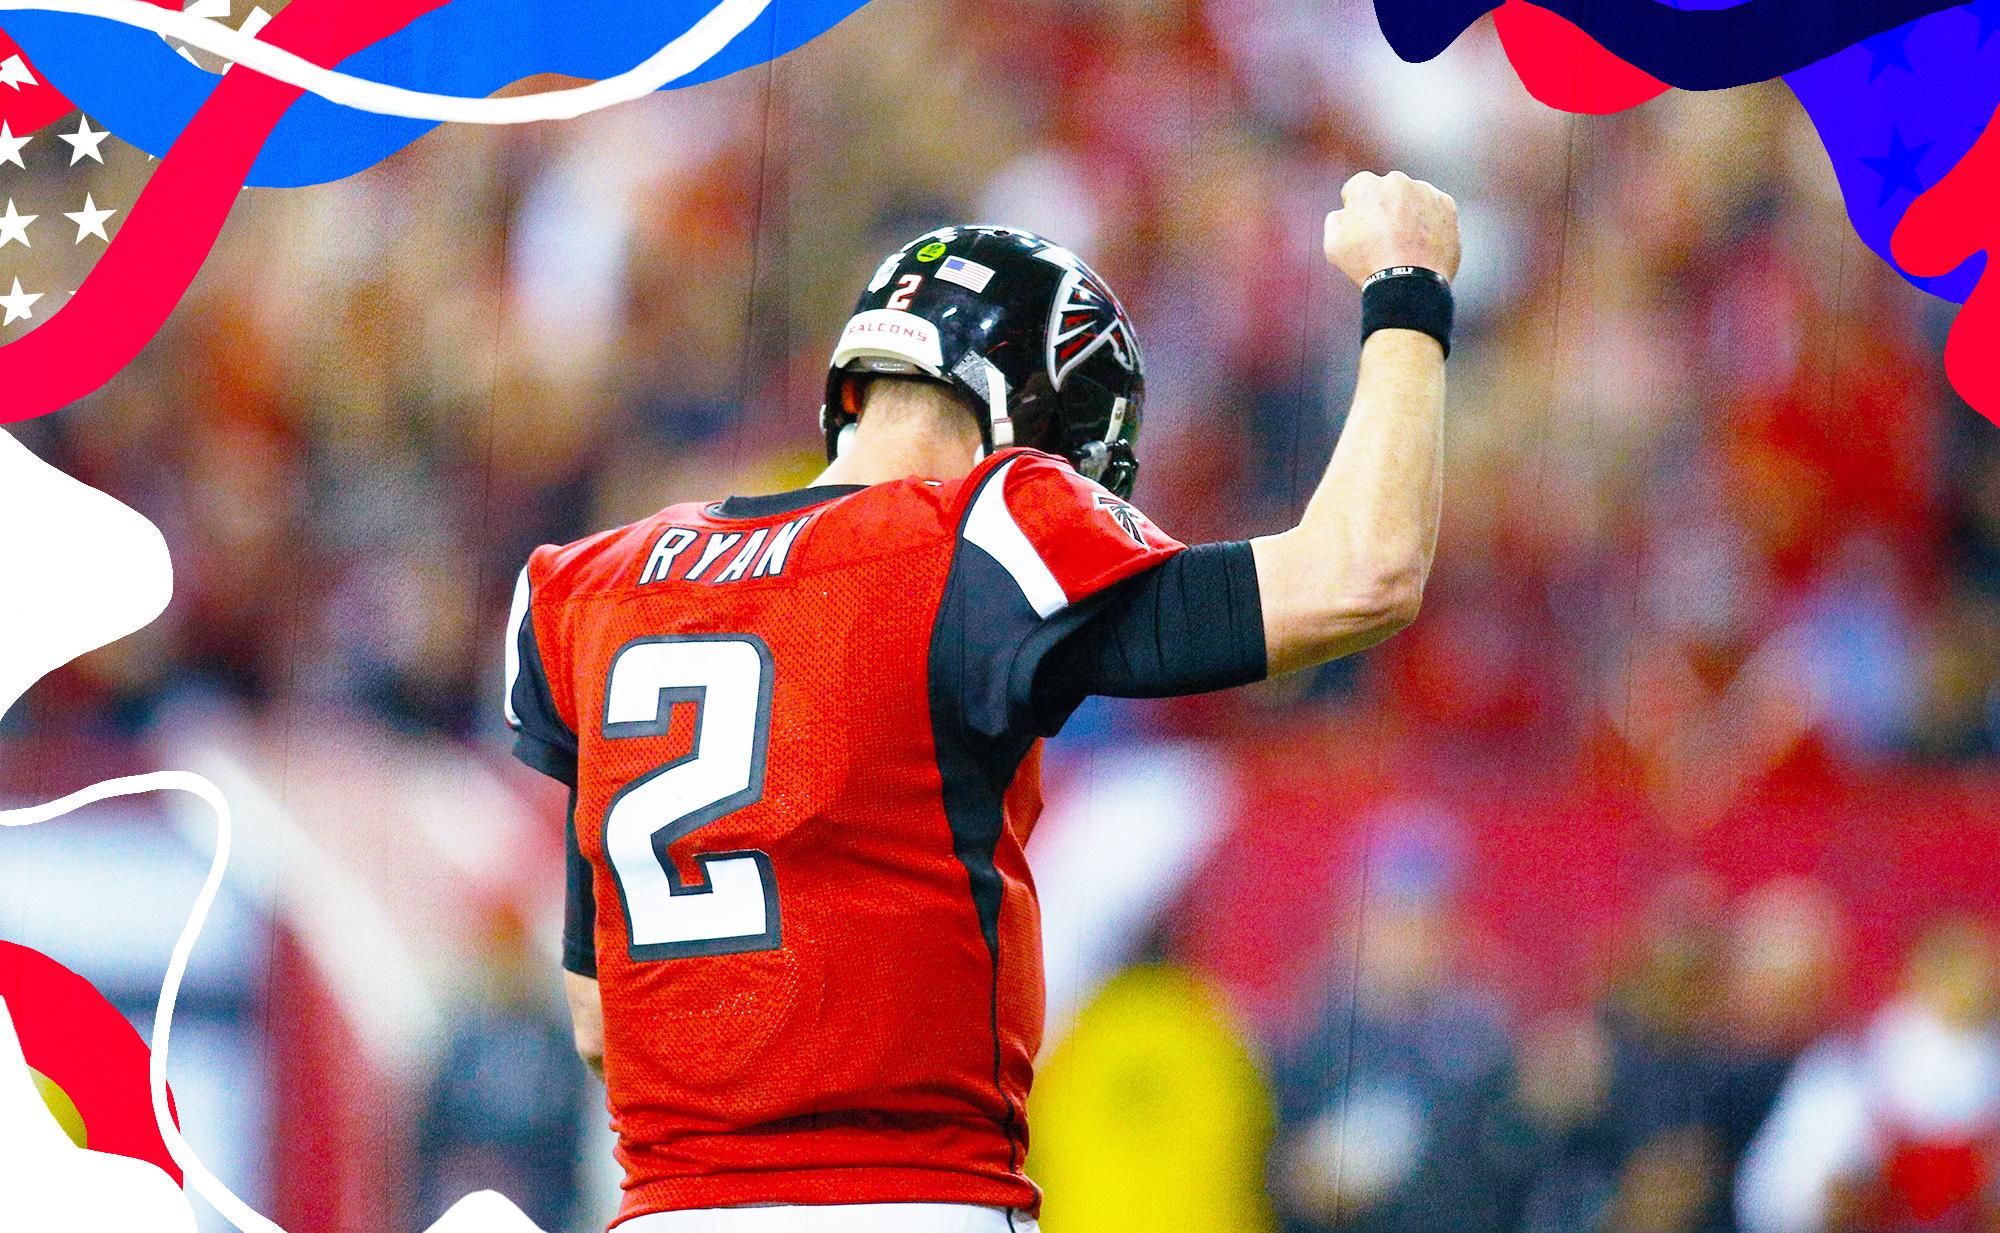 Matt Ryan is the NFL's most underappreciated quarterback